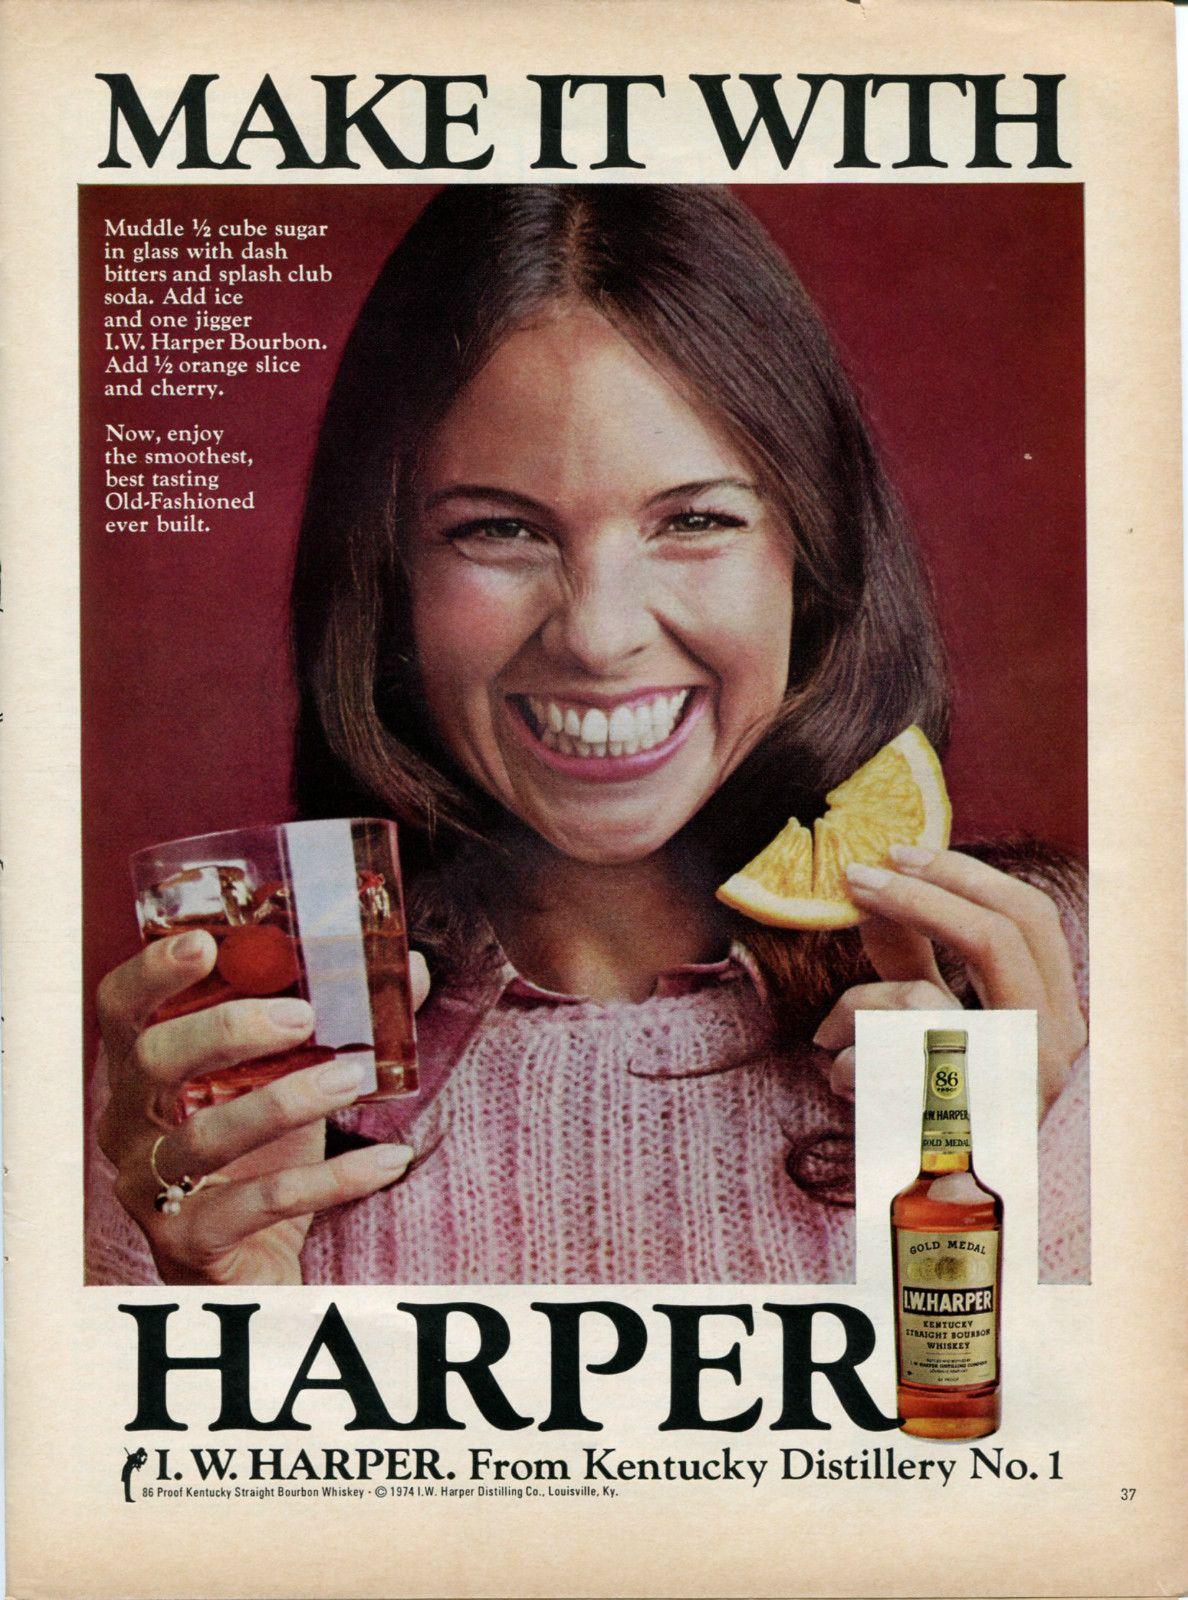 1974 Iw Harper Kentucky Bourbon Whiskey Woman Smiling Retro Vintage Original Ad 9 99